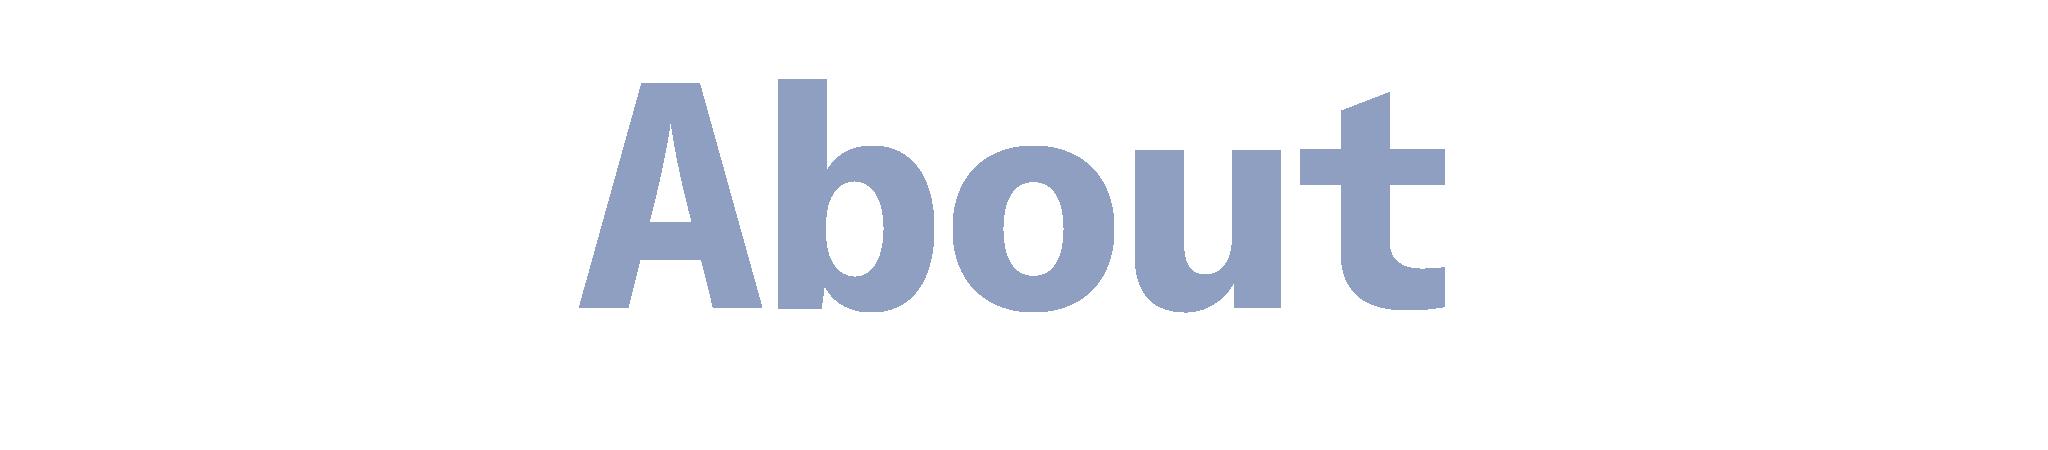 FoT_web.banner_about.blaa